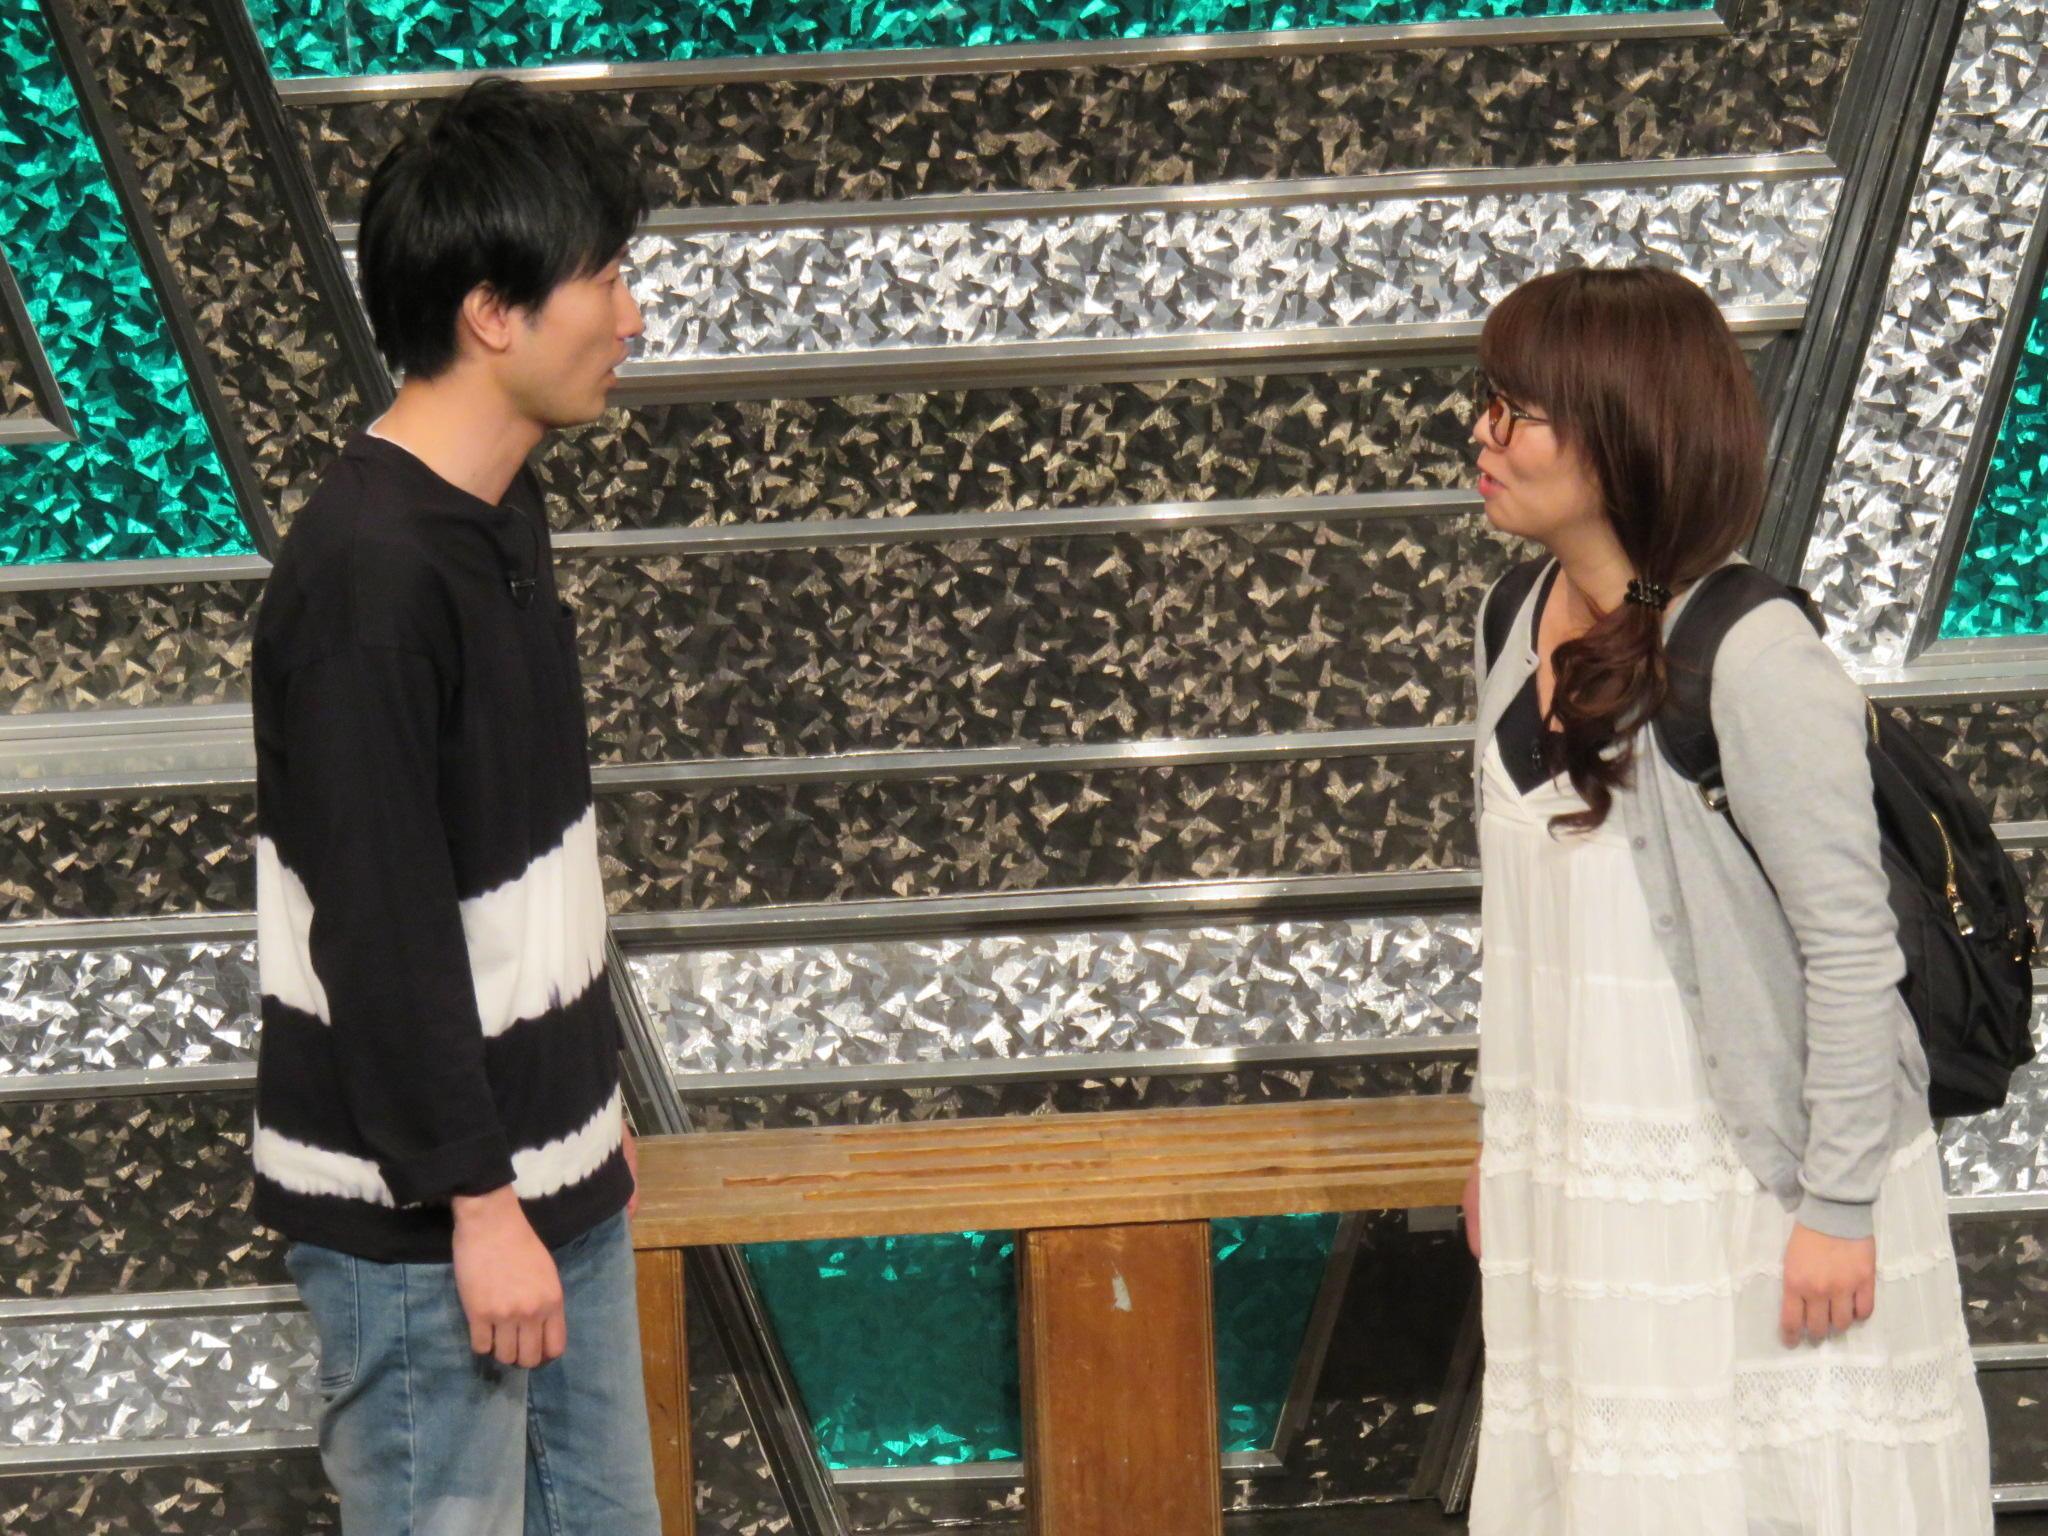 http://news.yoshimoto.co.jp/20170331201129-34a43ea3643df0786f5c60ef87bf56b4a4e47eac.jpg